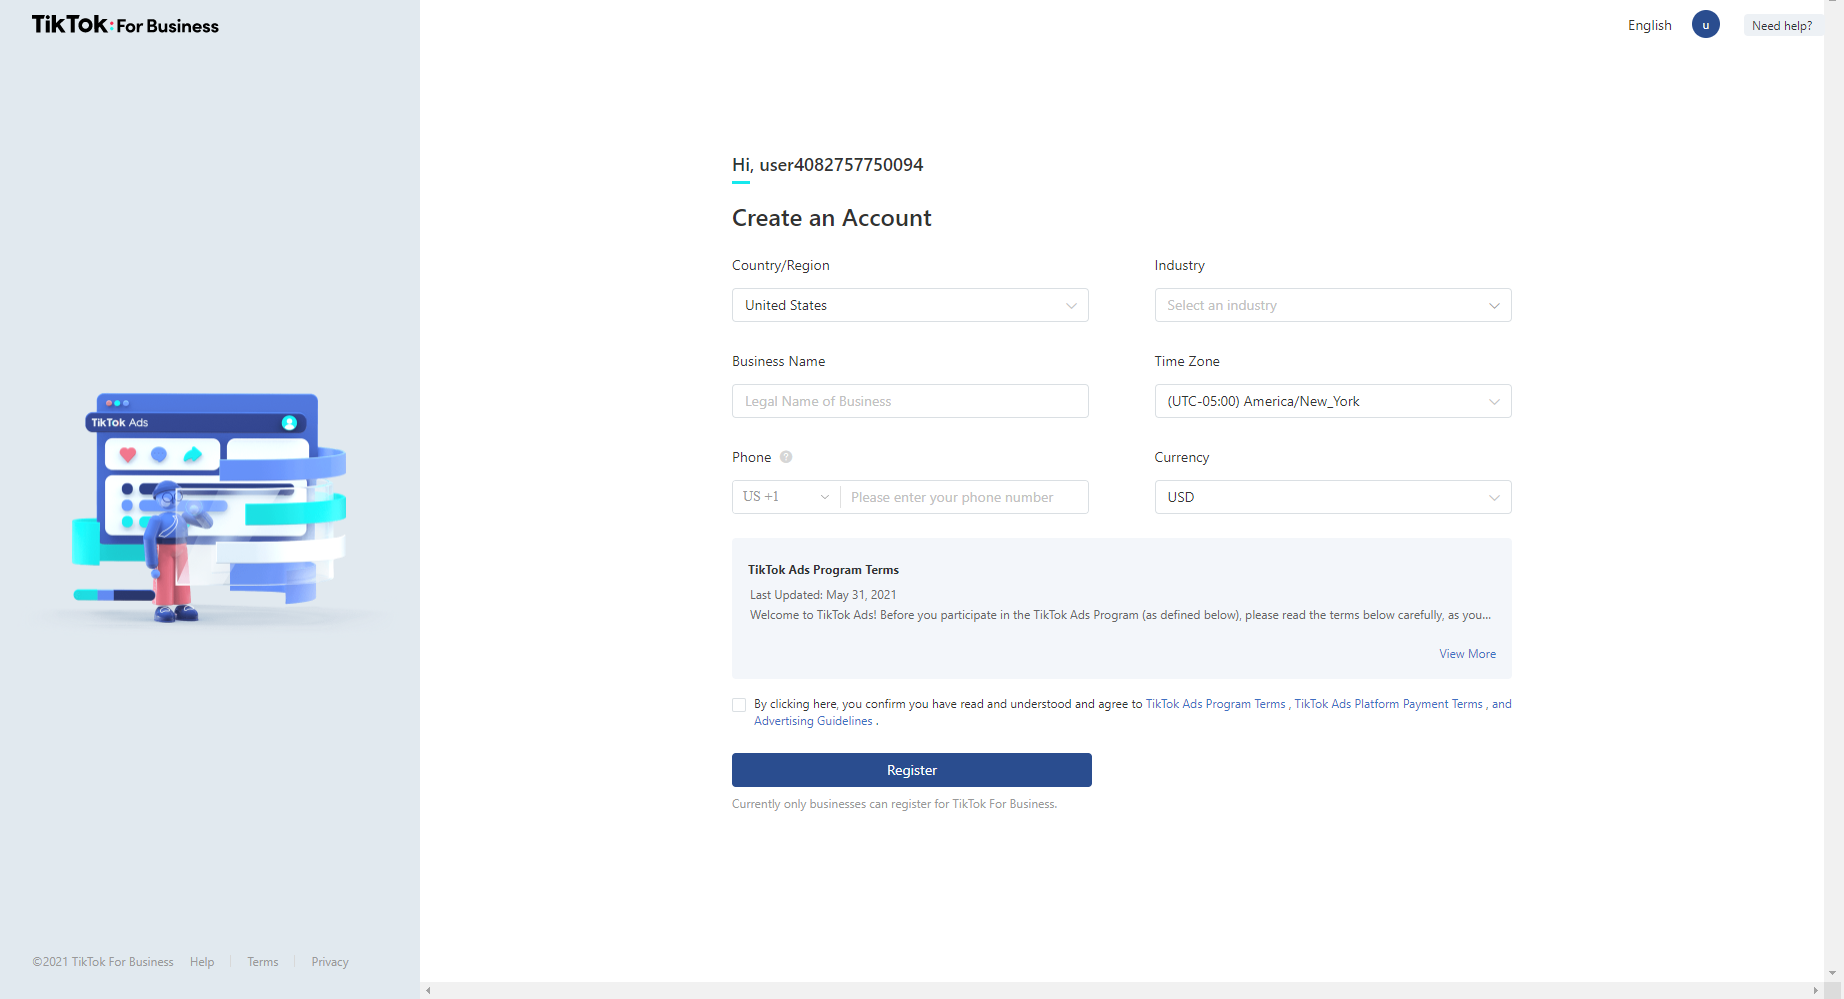 TikTok Ads Manager Registration Screenshot